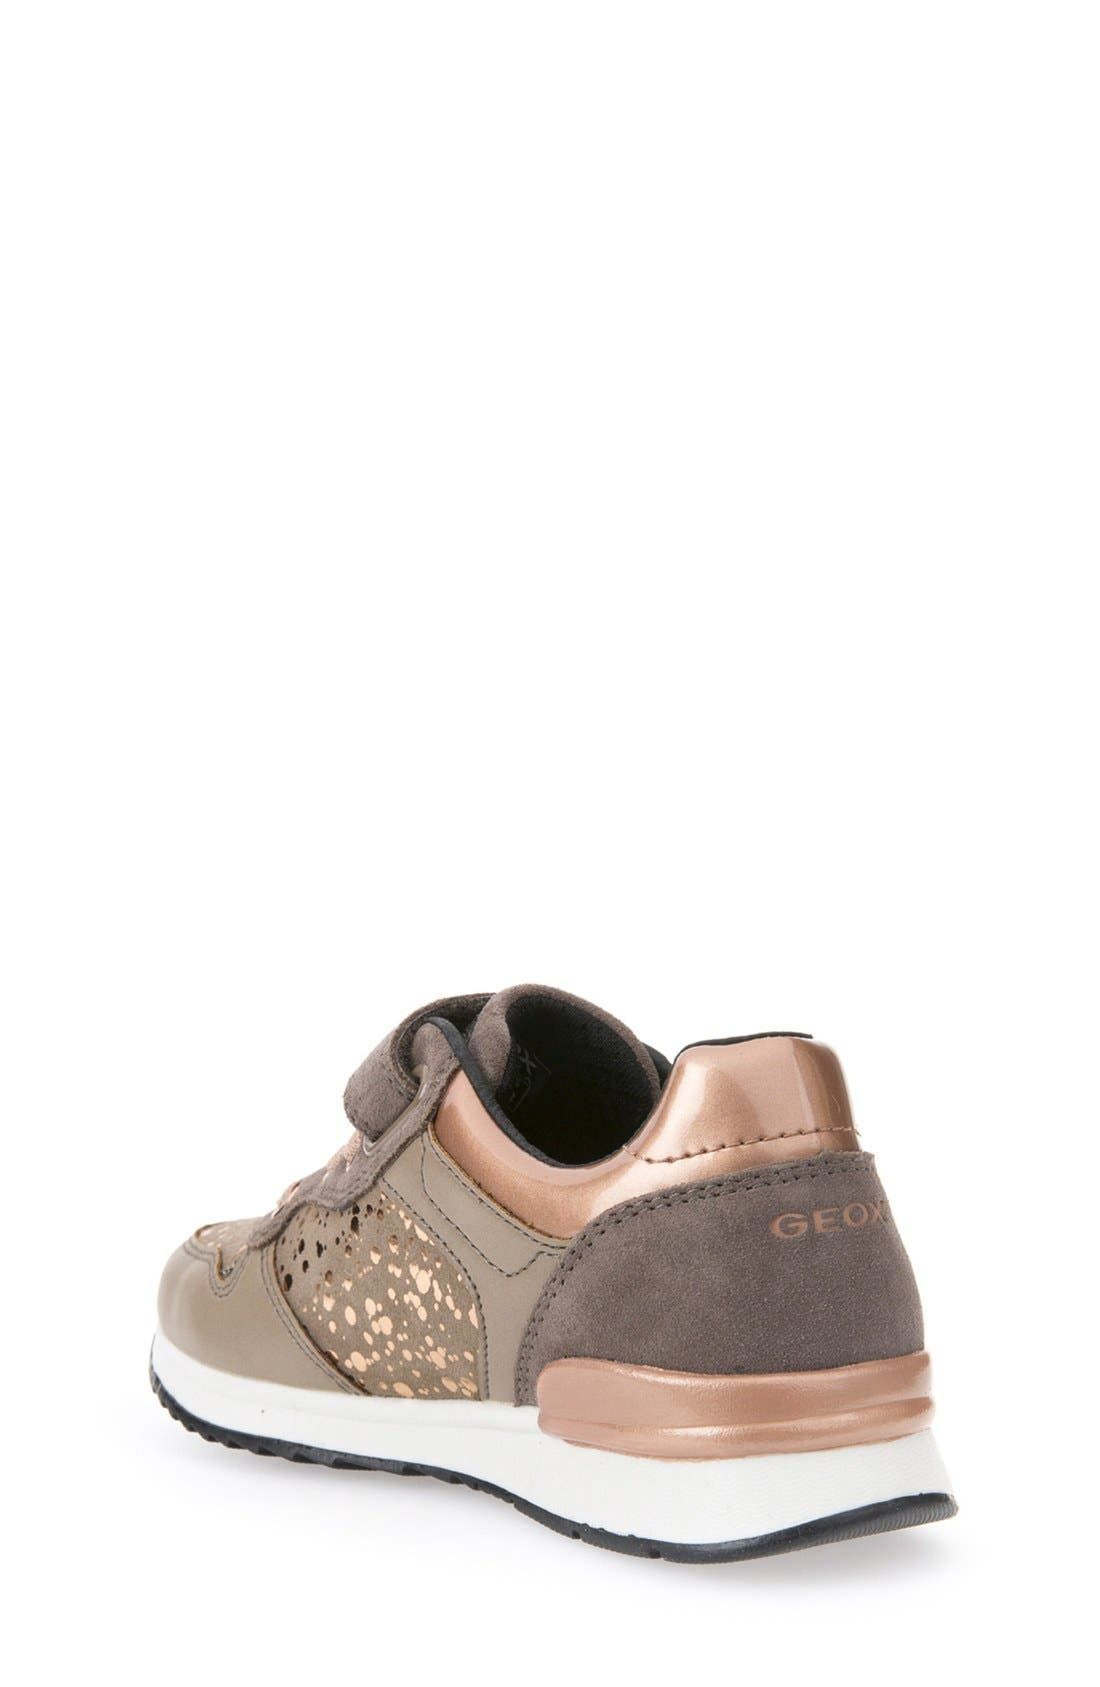 Maisie Sneaker,                             Alternate thumbnail 2, color,                             Dark Beige